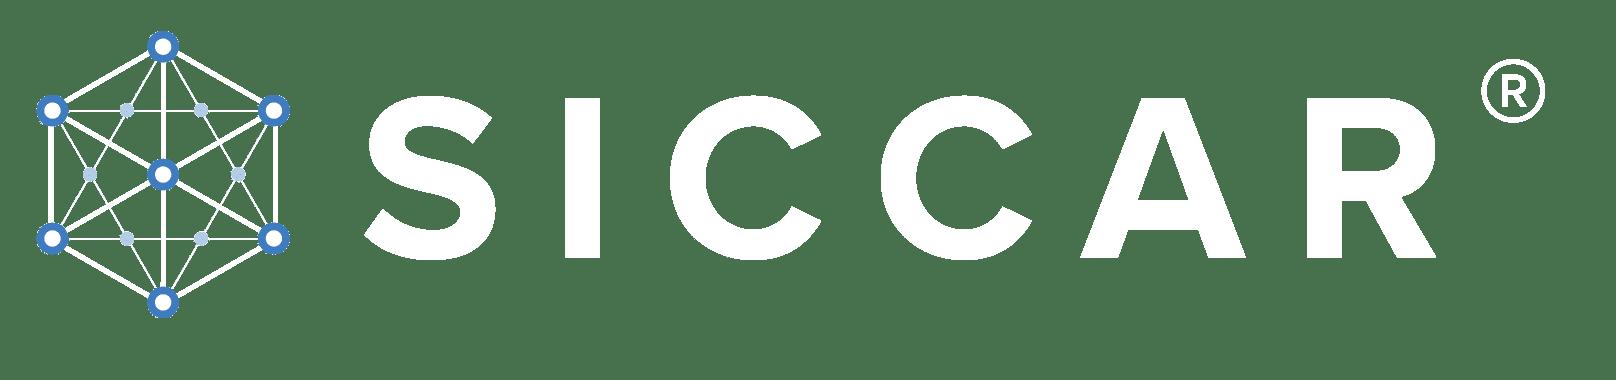 siccar.net